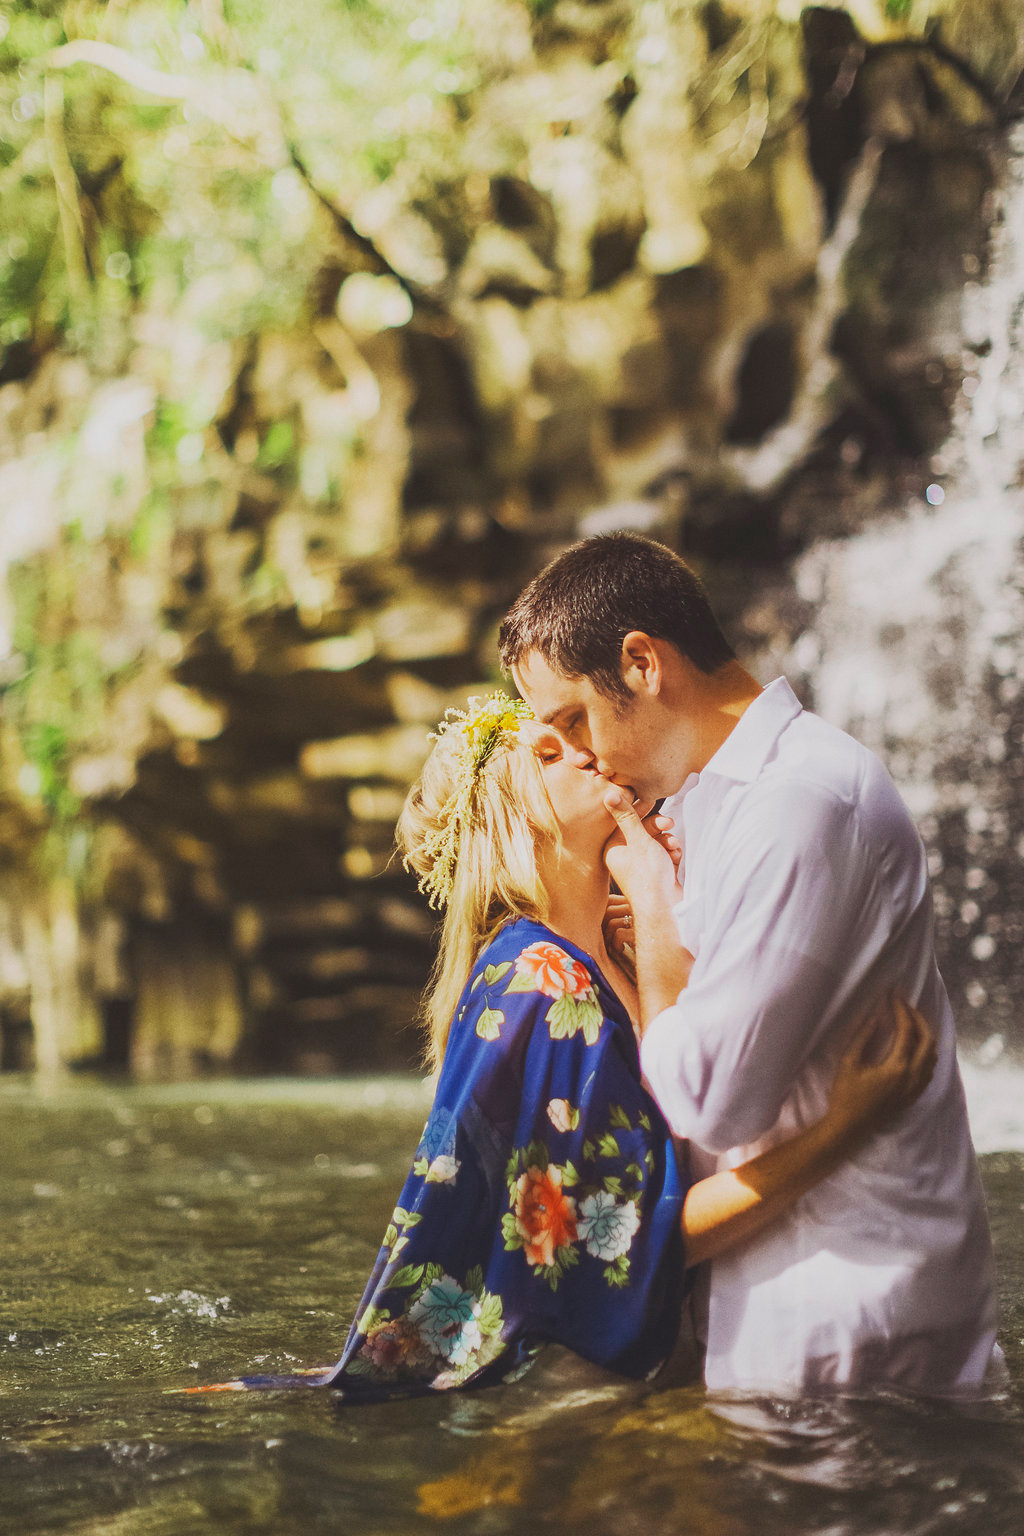 angie-diaz-photography-crisna-brandon-day-after-wedding-22.jpg